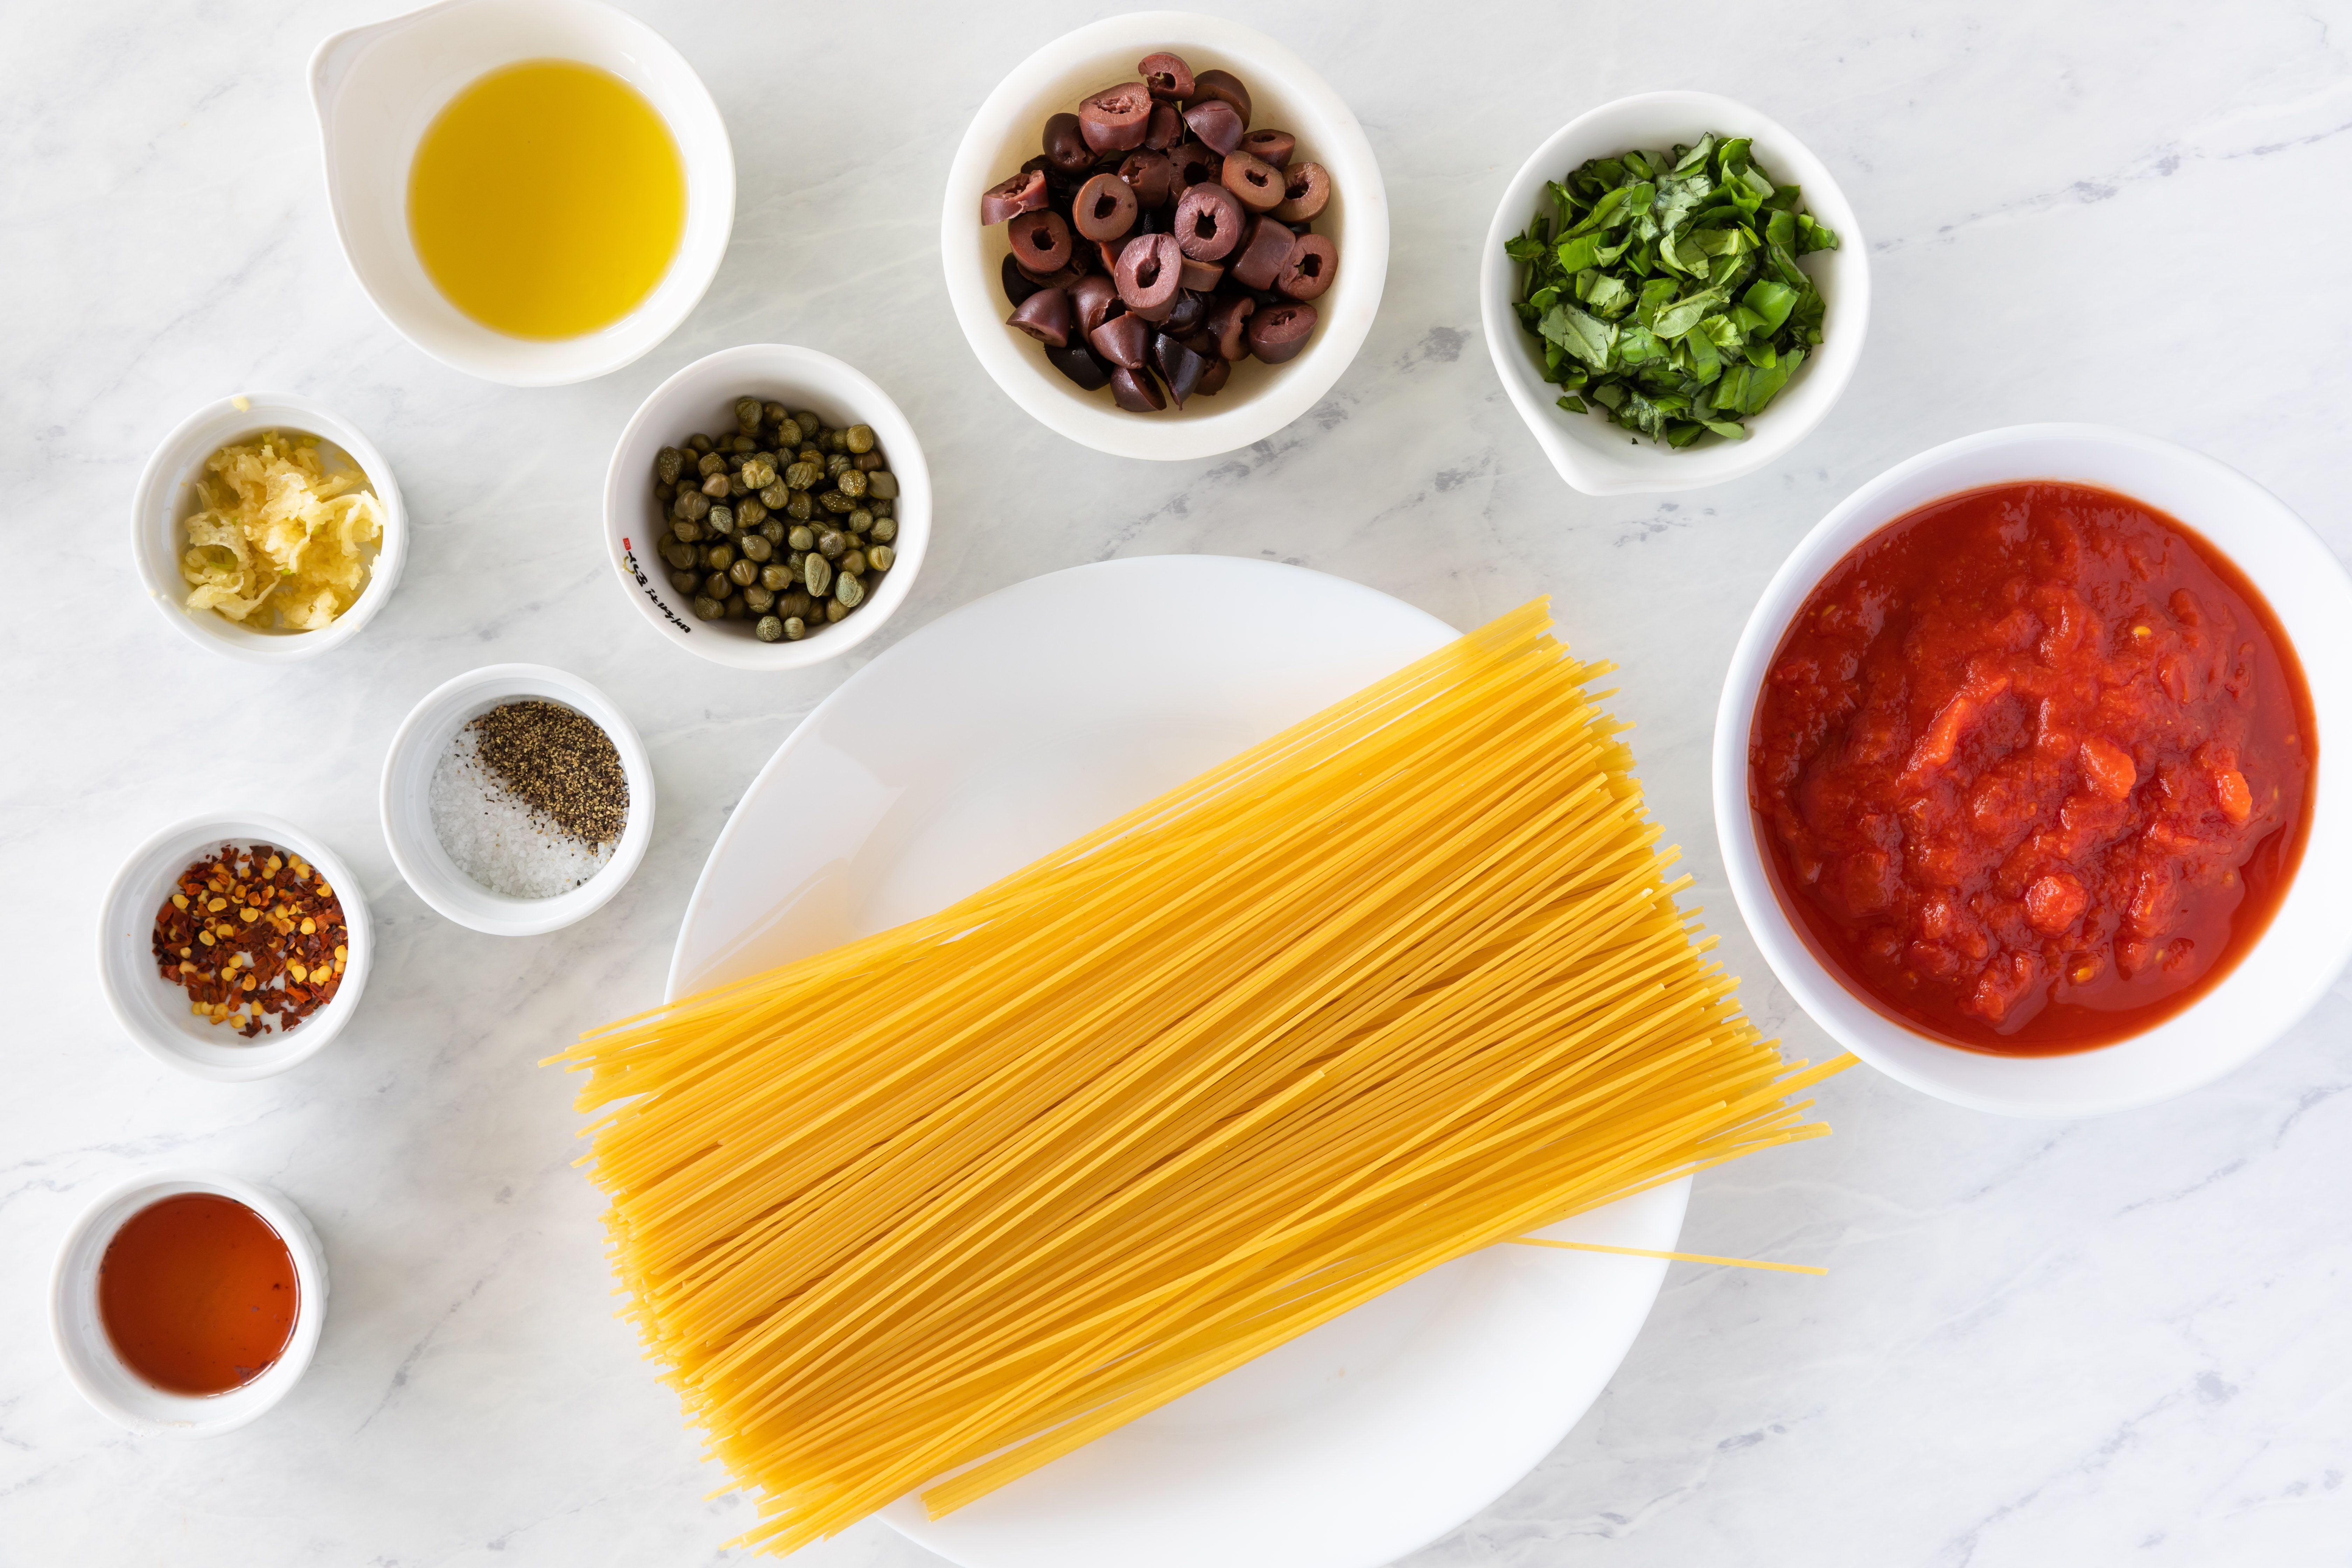 Ingredients for easy vegan pasta puttanesca